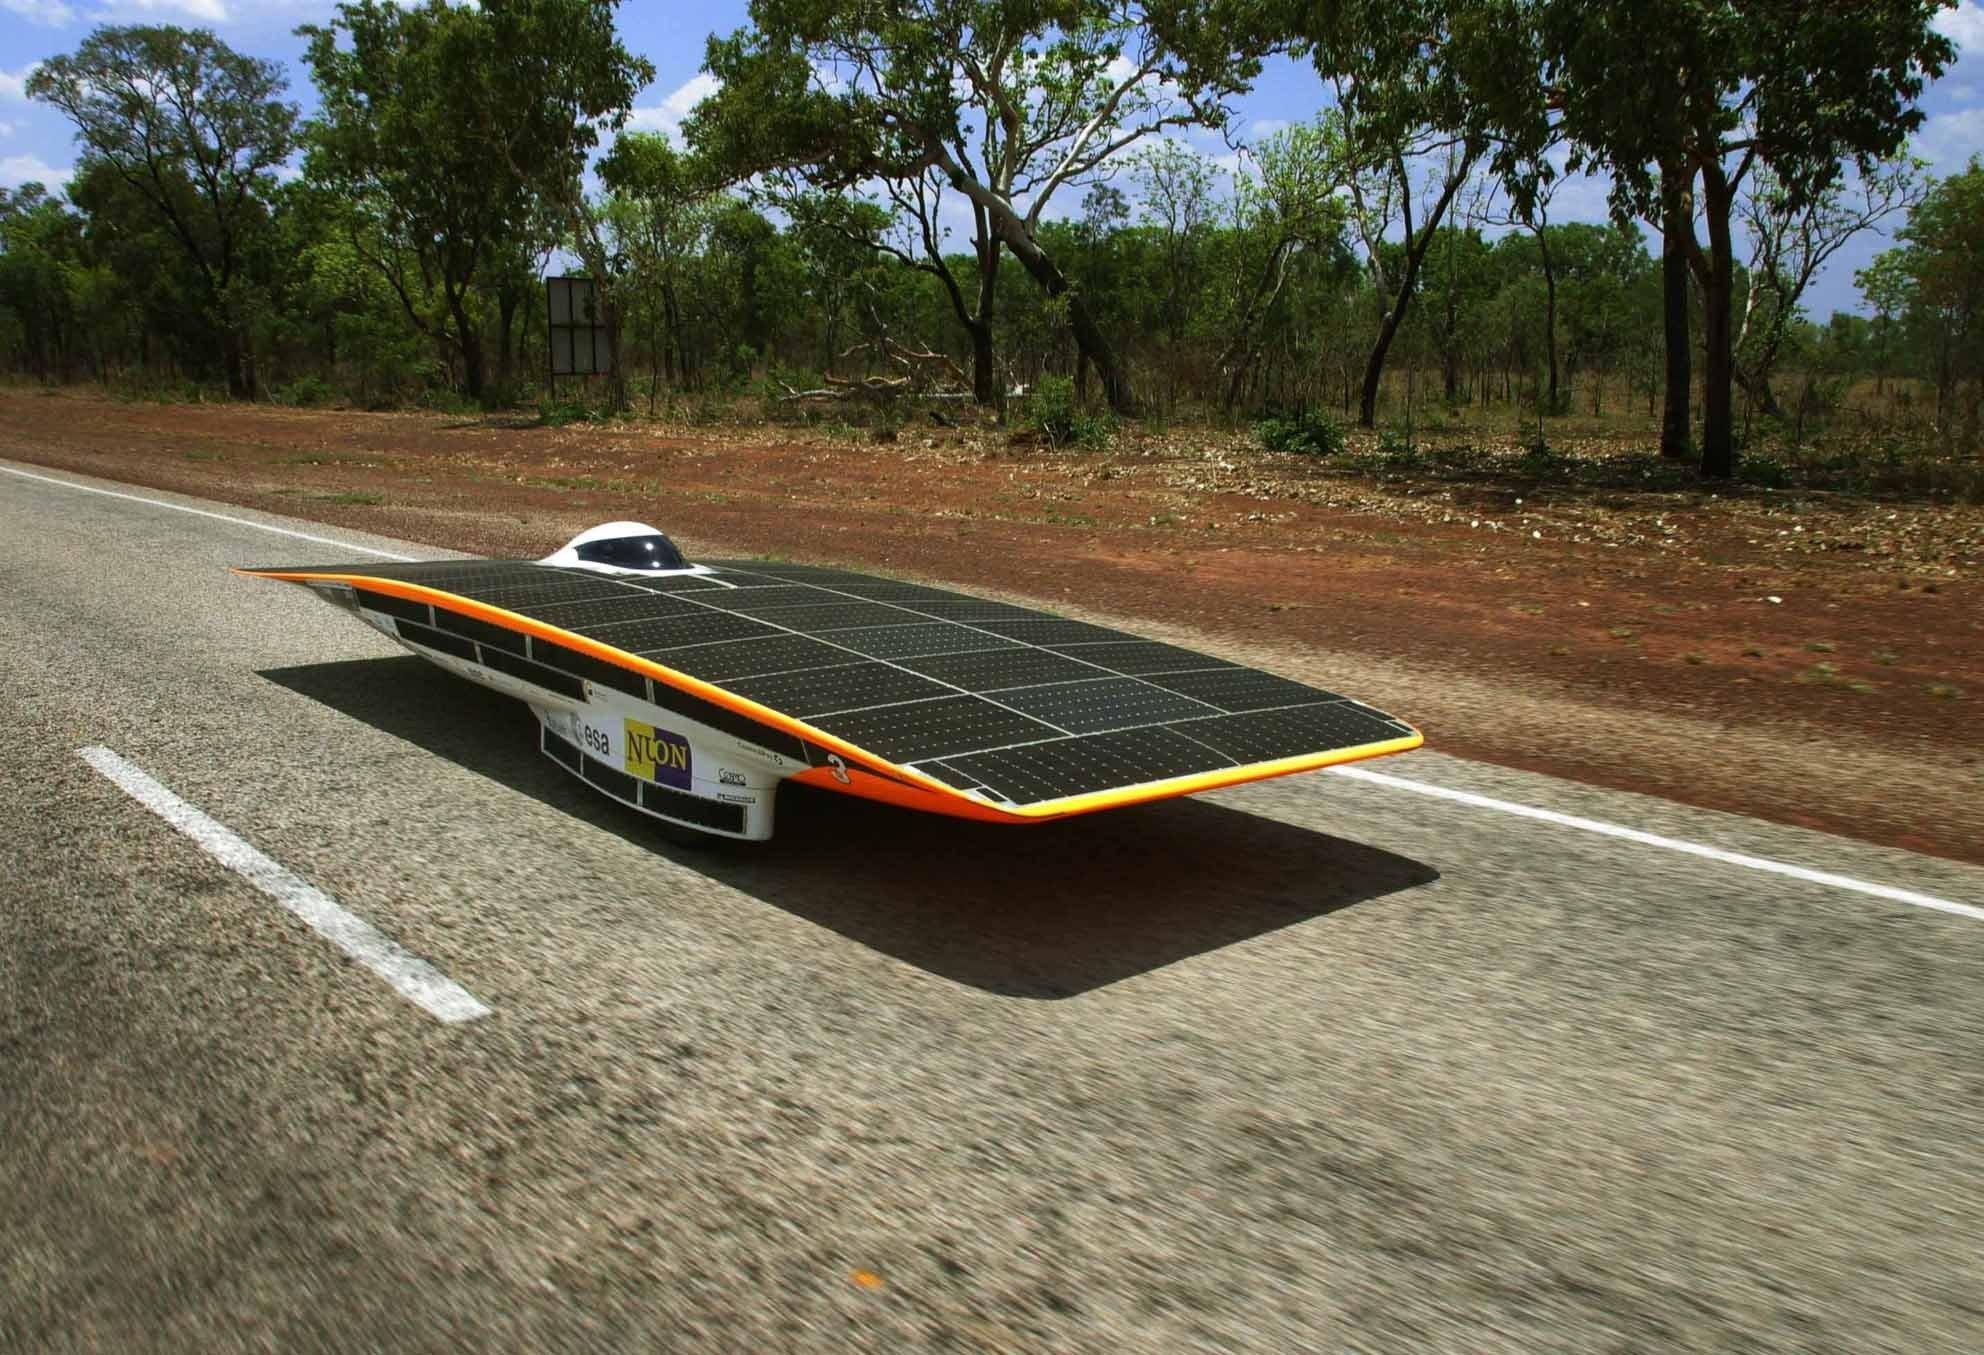 The_Nuna_II_wins_World_Solar_Challenge_2003_using_space_technologies.jpg